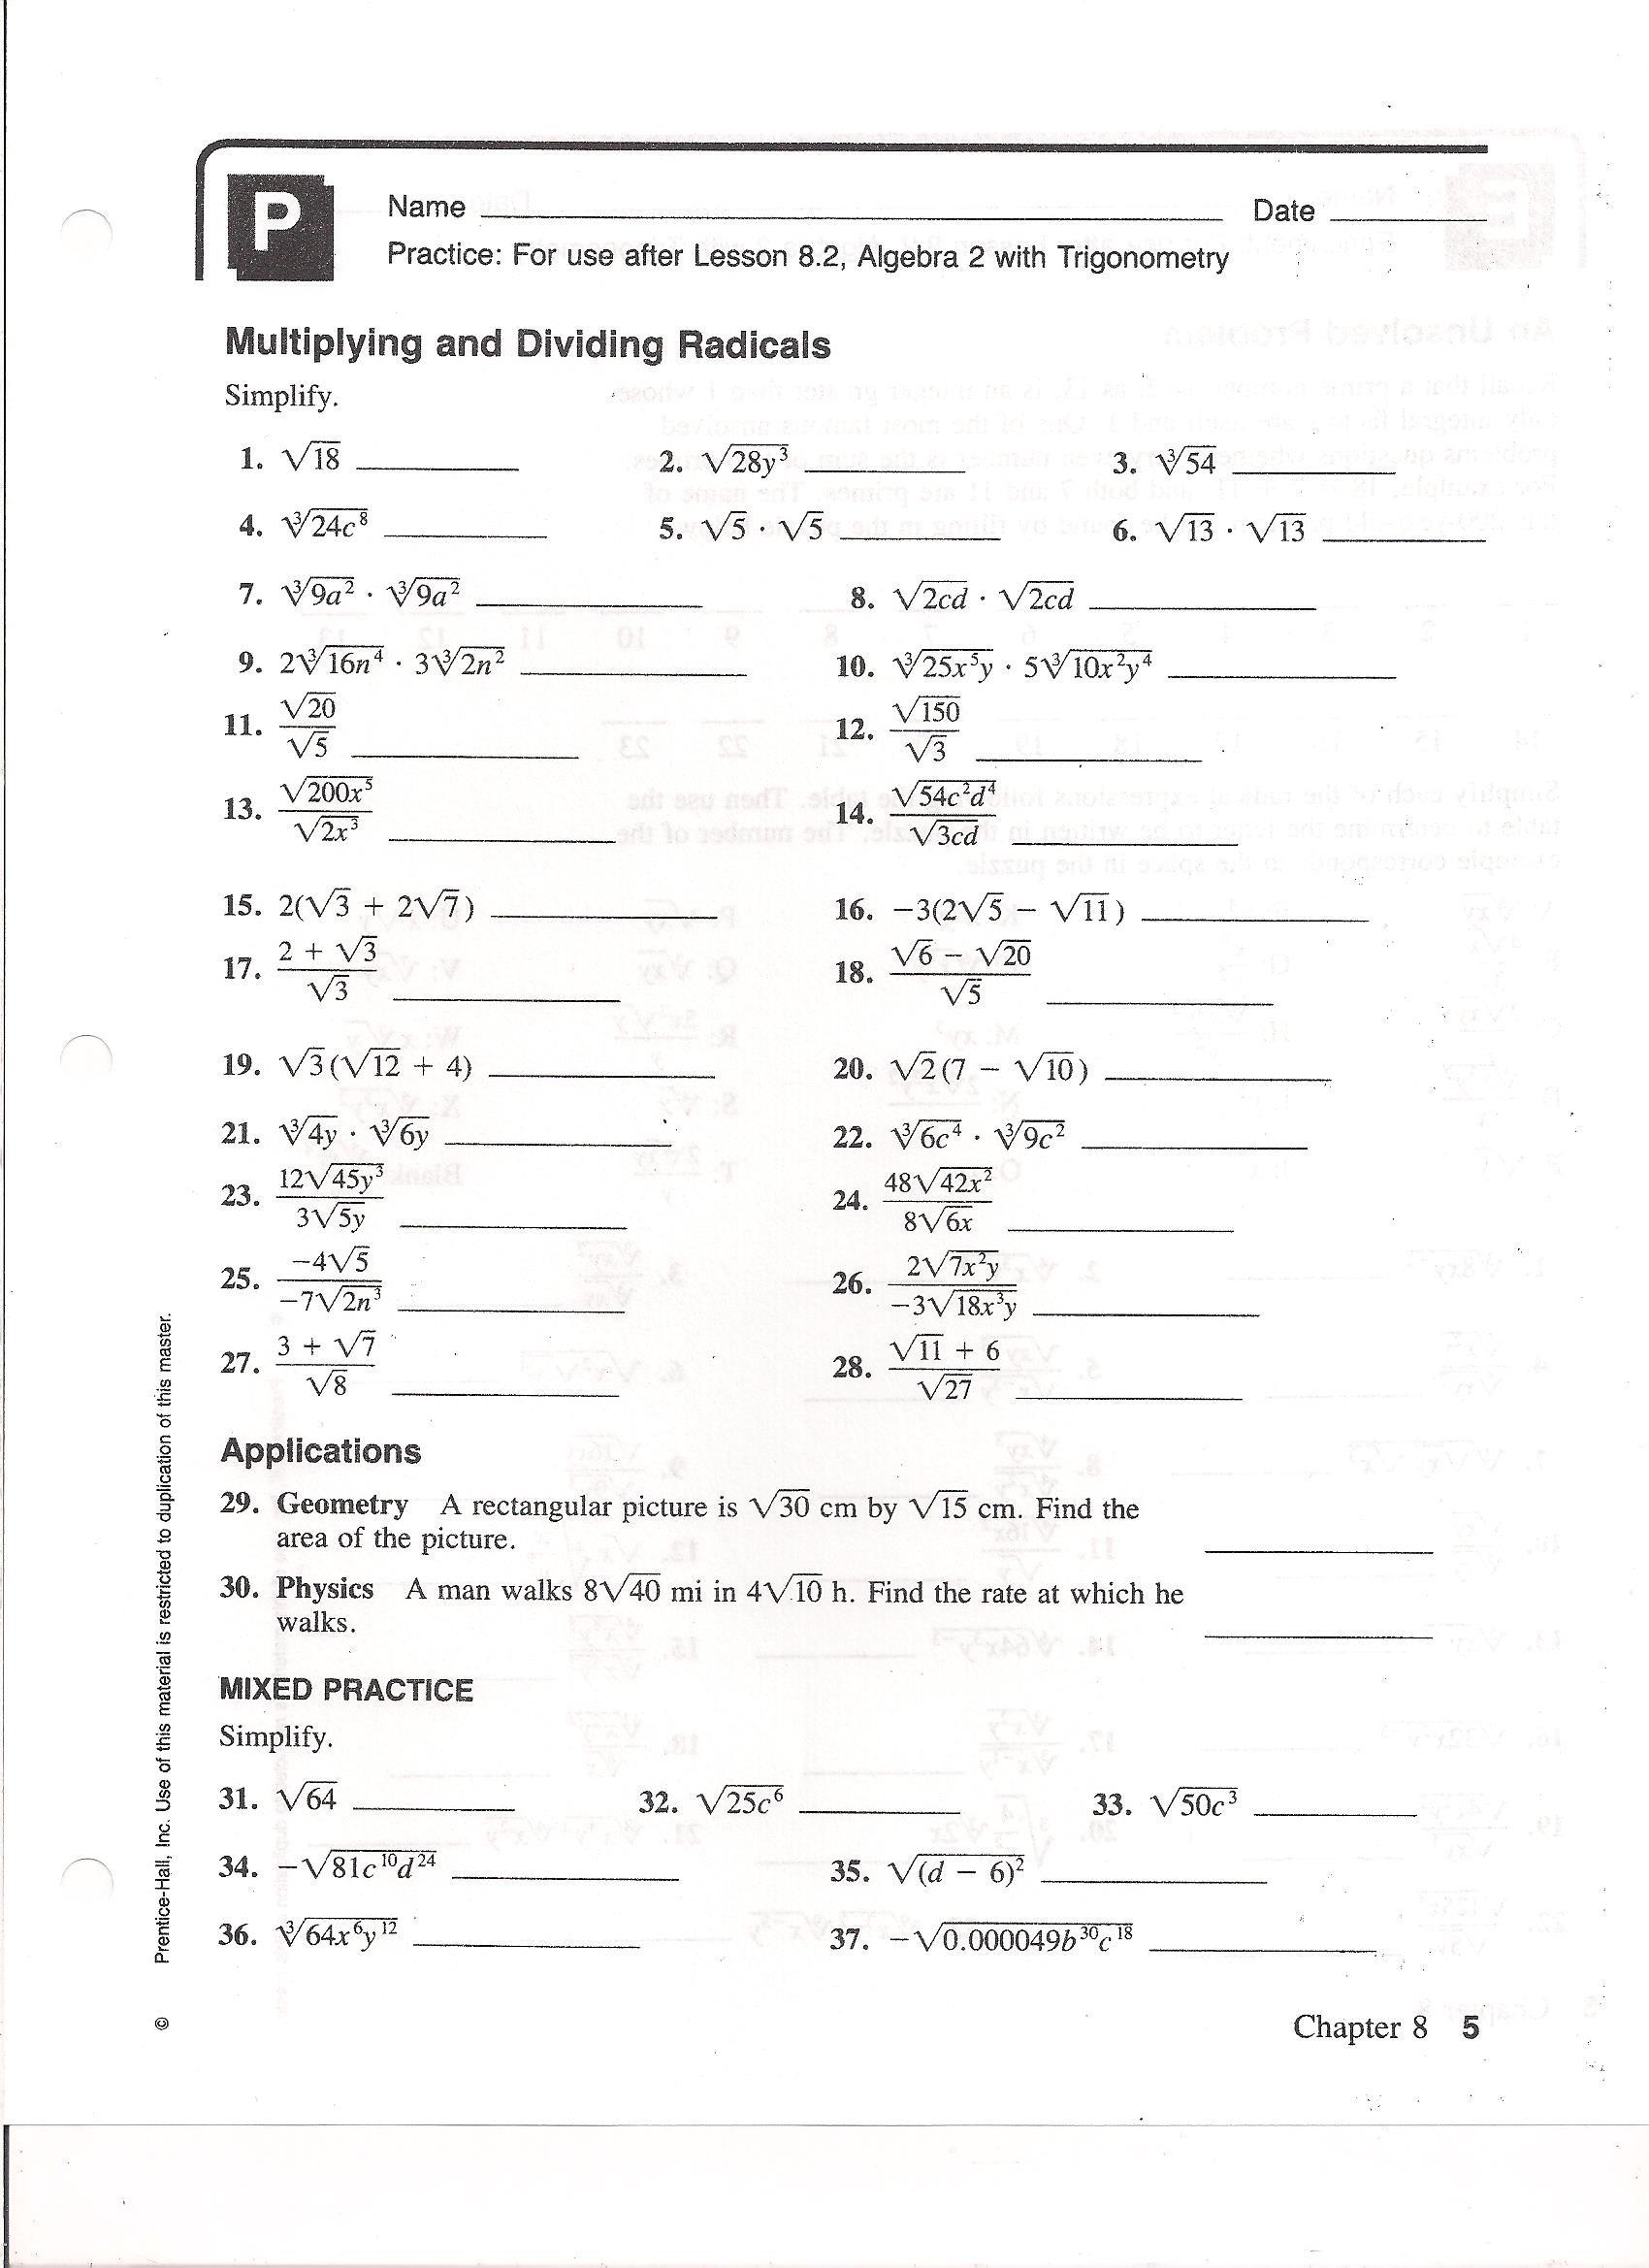 Simplifying Radicals with Variables Worksheet